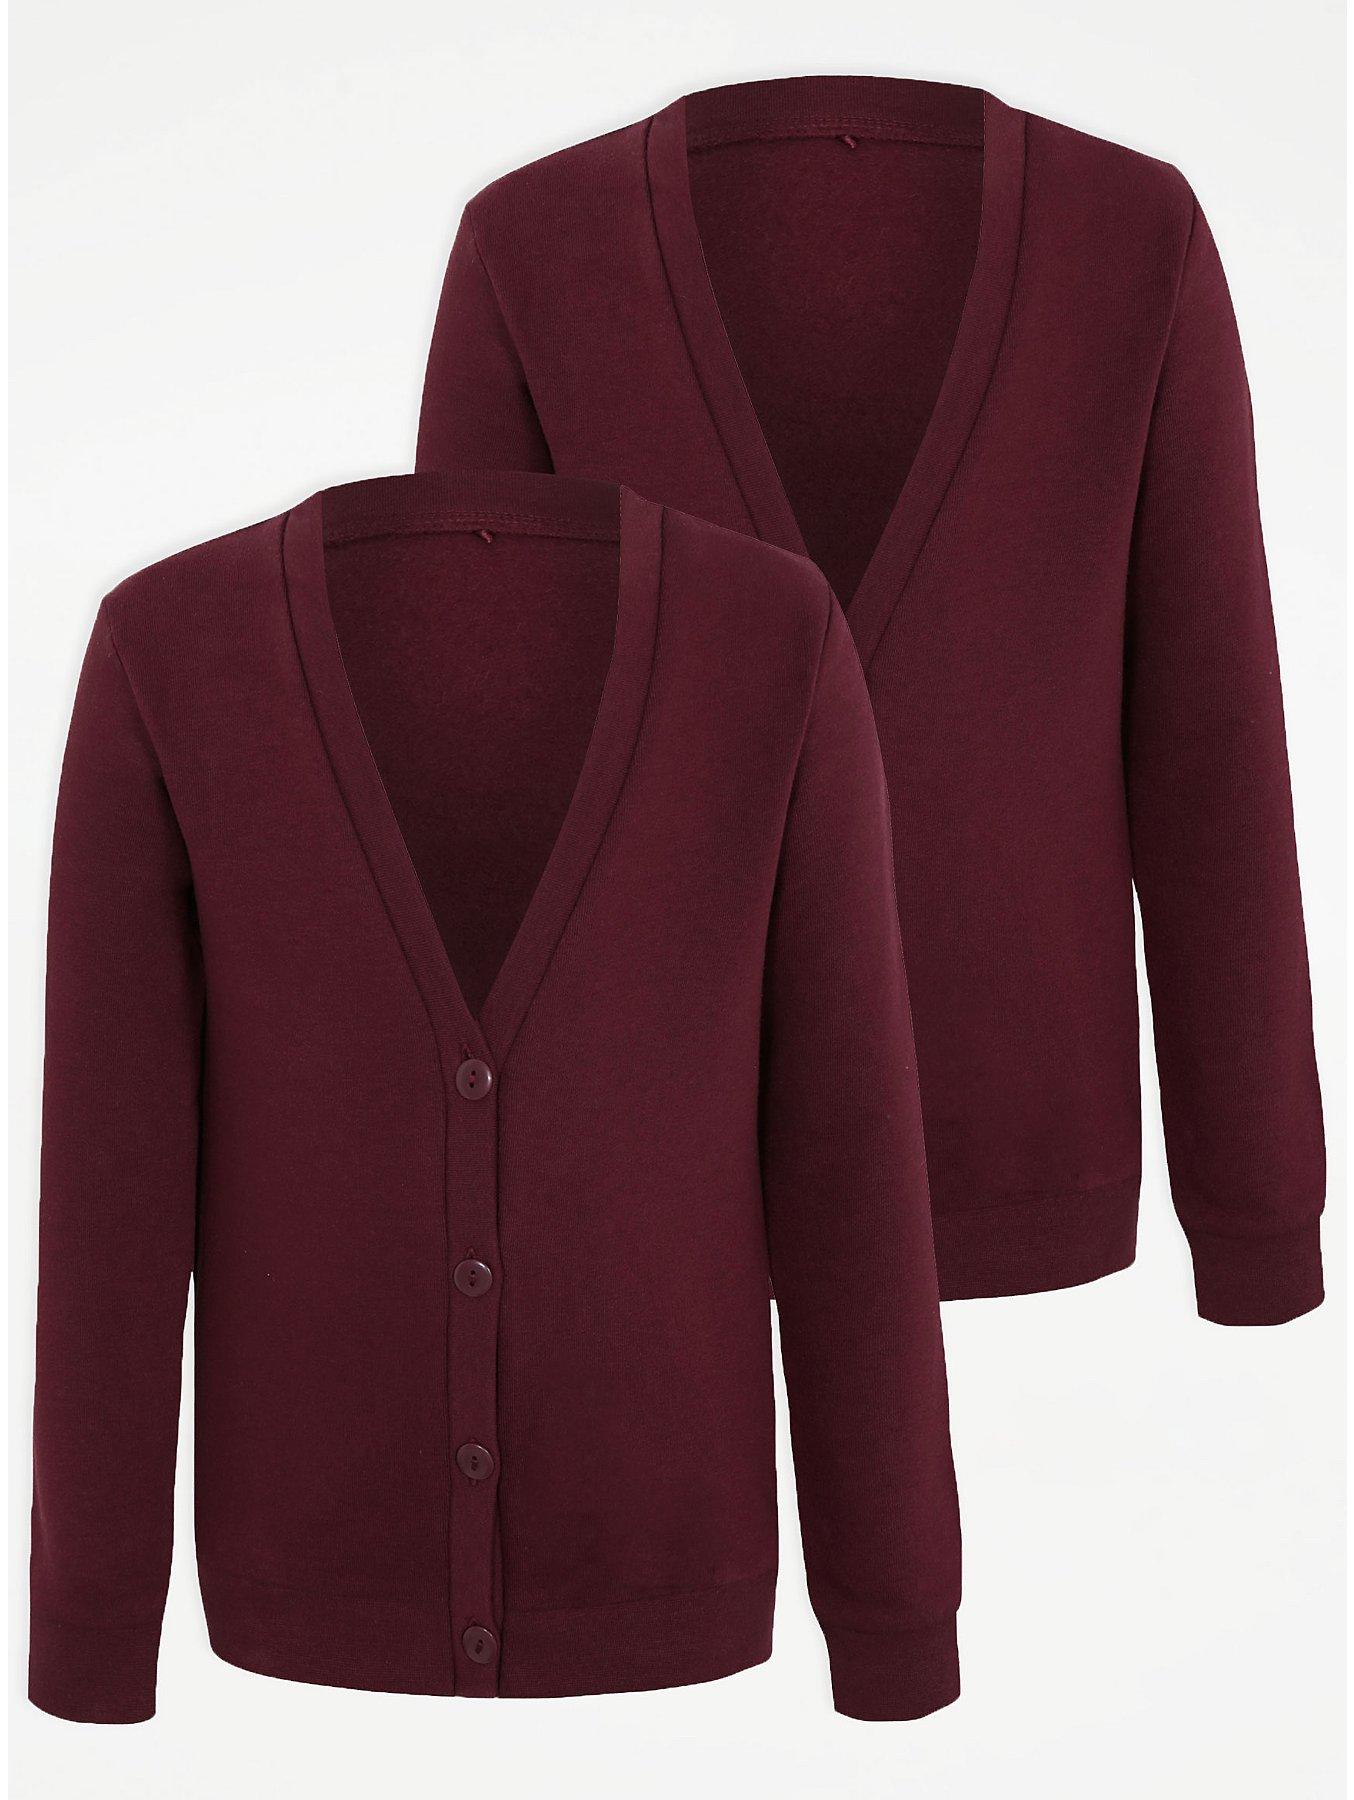 Girls Burgundy Jersey School Cardigan 2 Pack. Reset 96a73dcc5